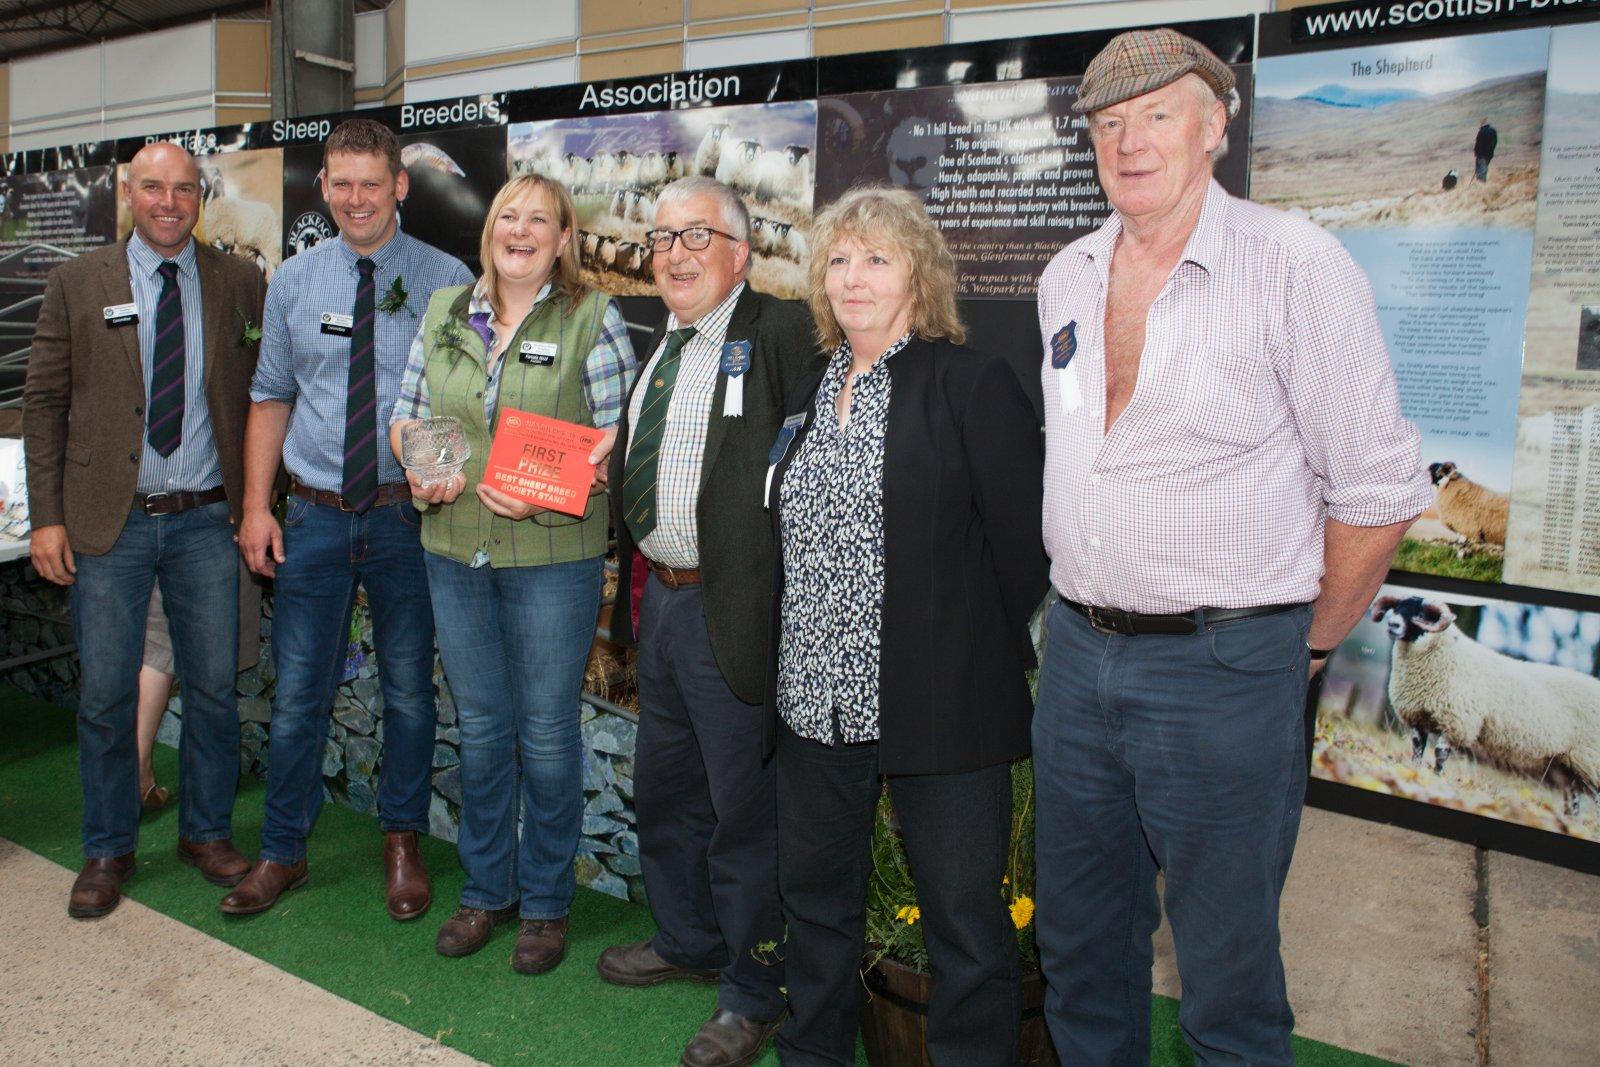 Best Breed Society Stand winners, Blackface Sheep Breeders Association